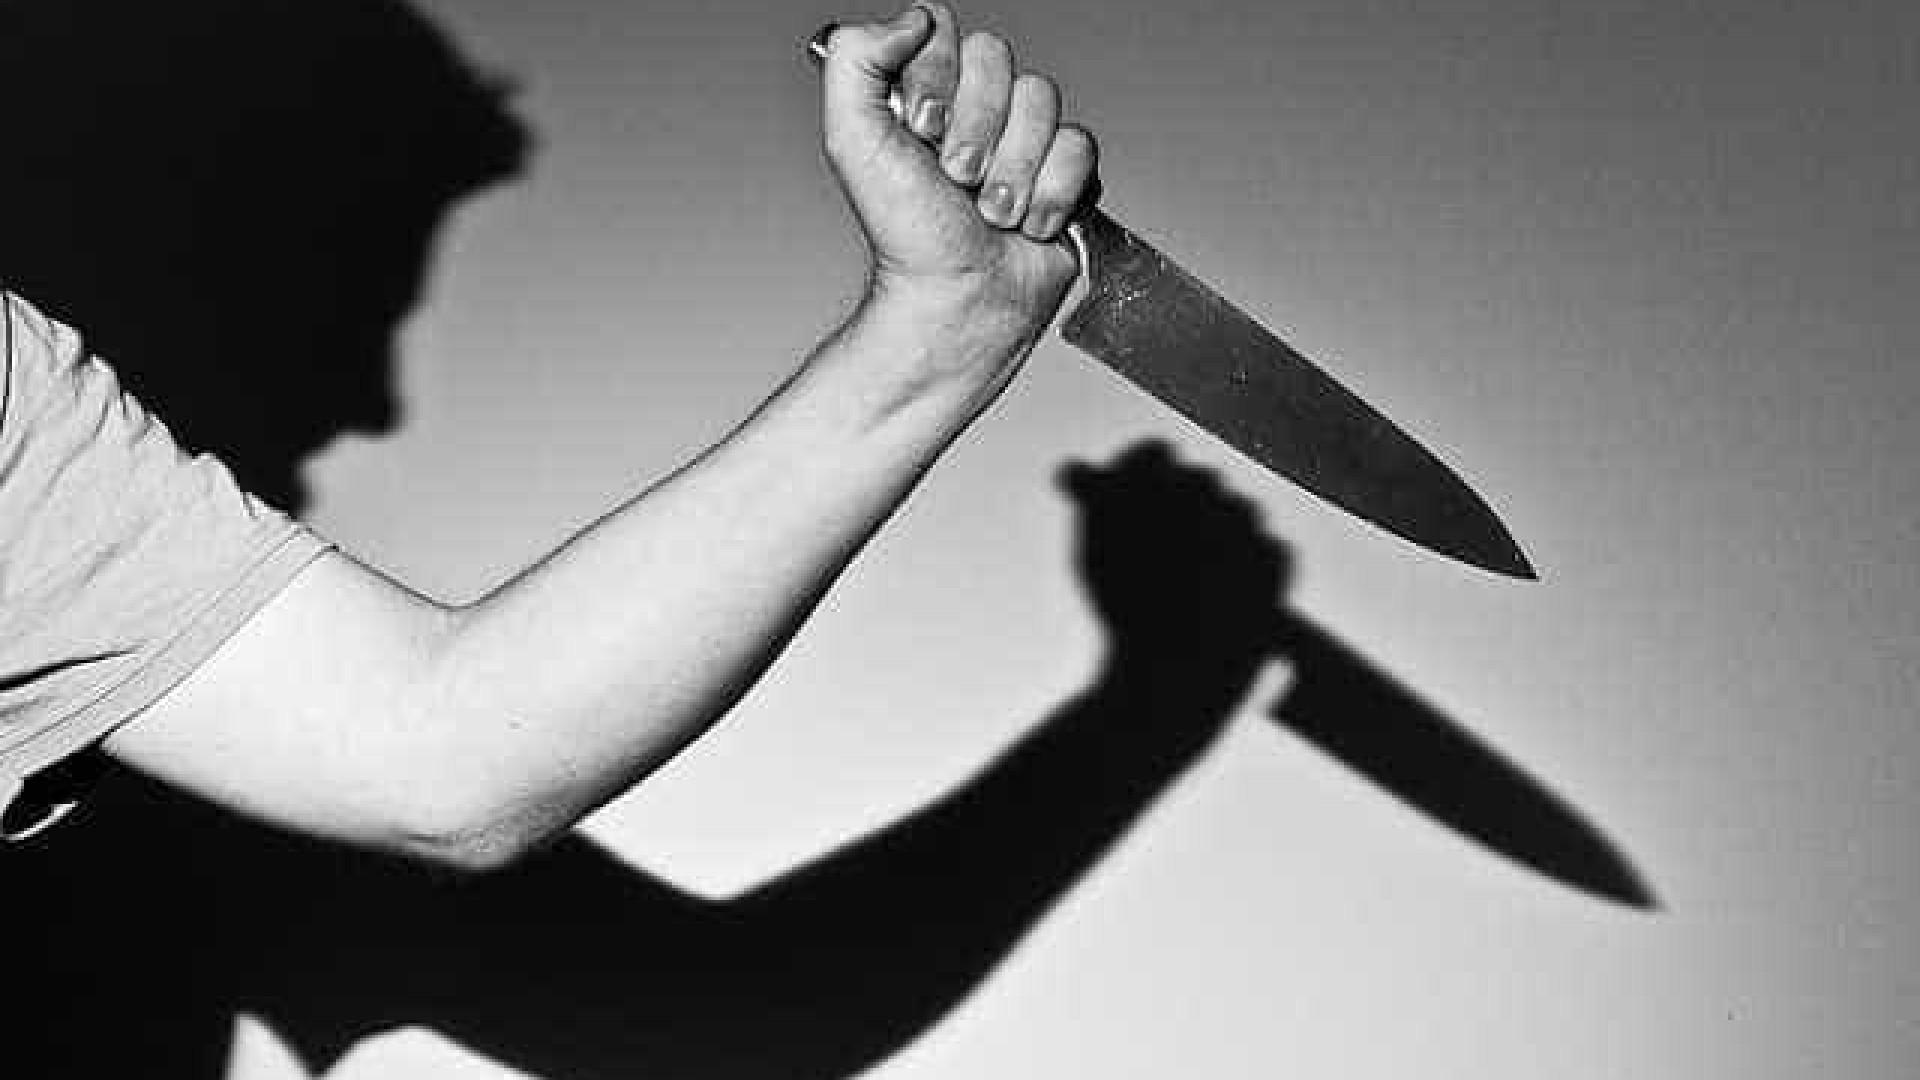 Idoso de 76 anos é morto a facadas  dentro de casa em Roraima